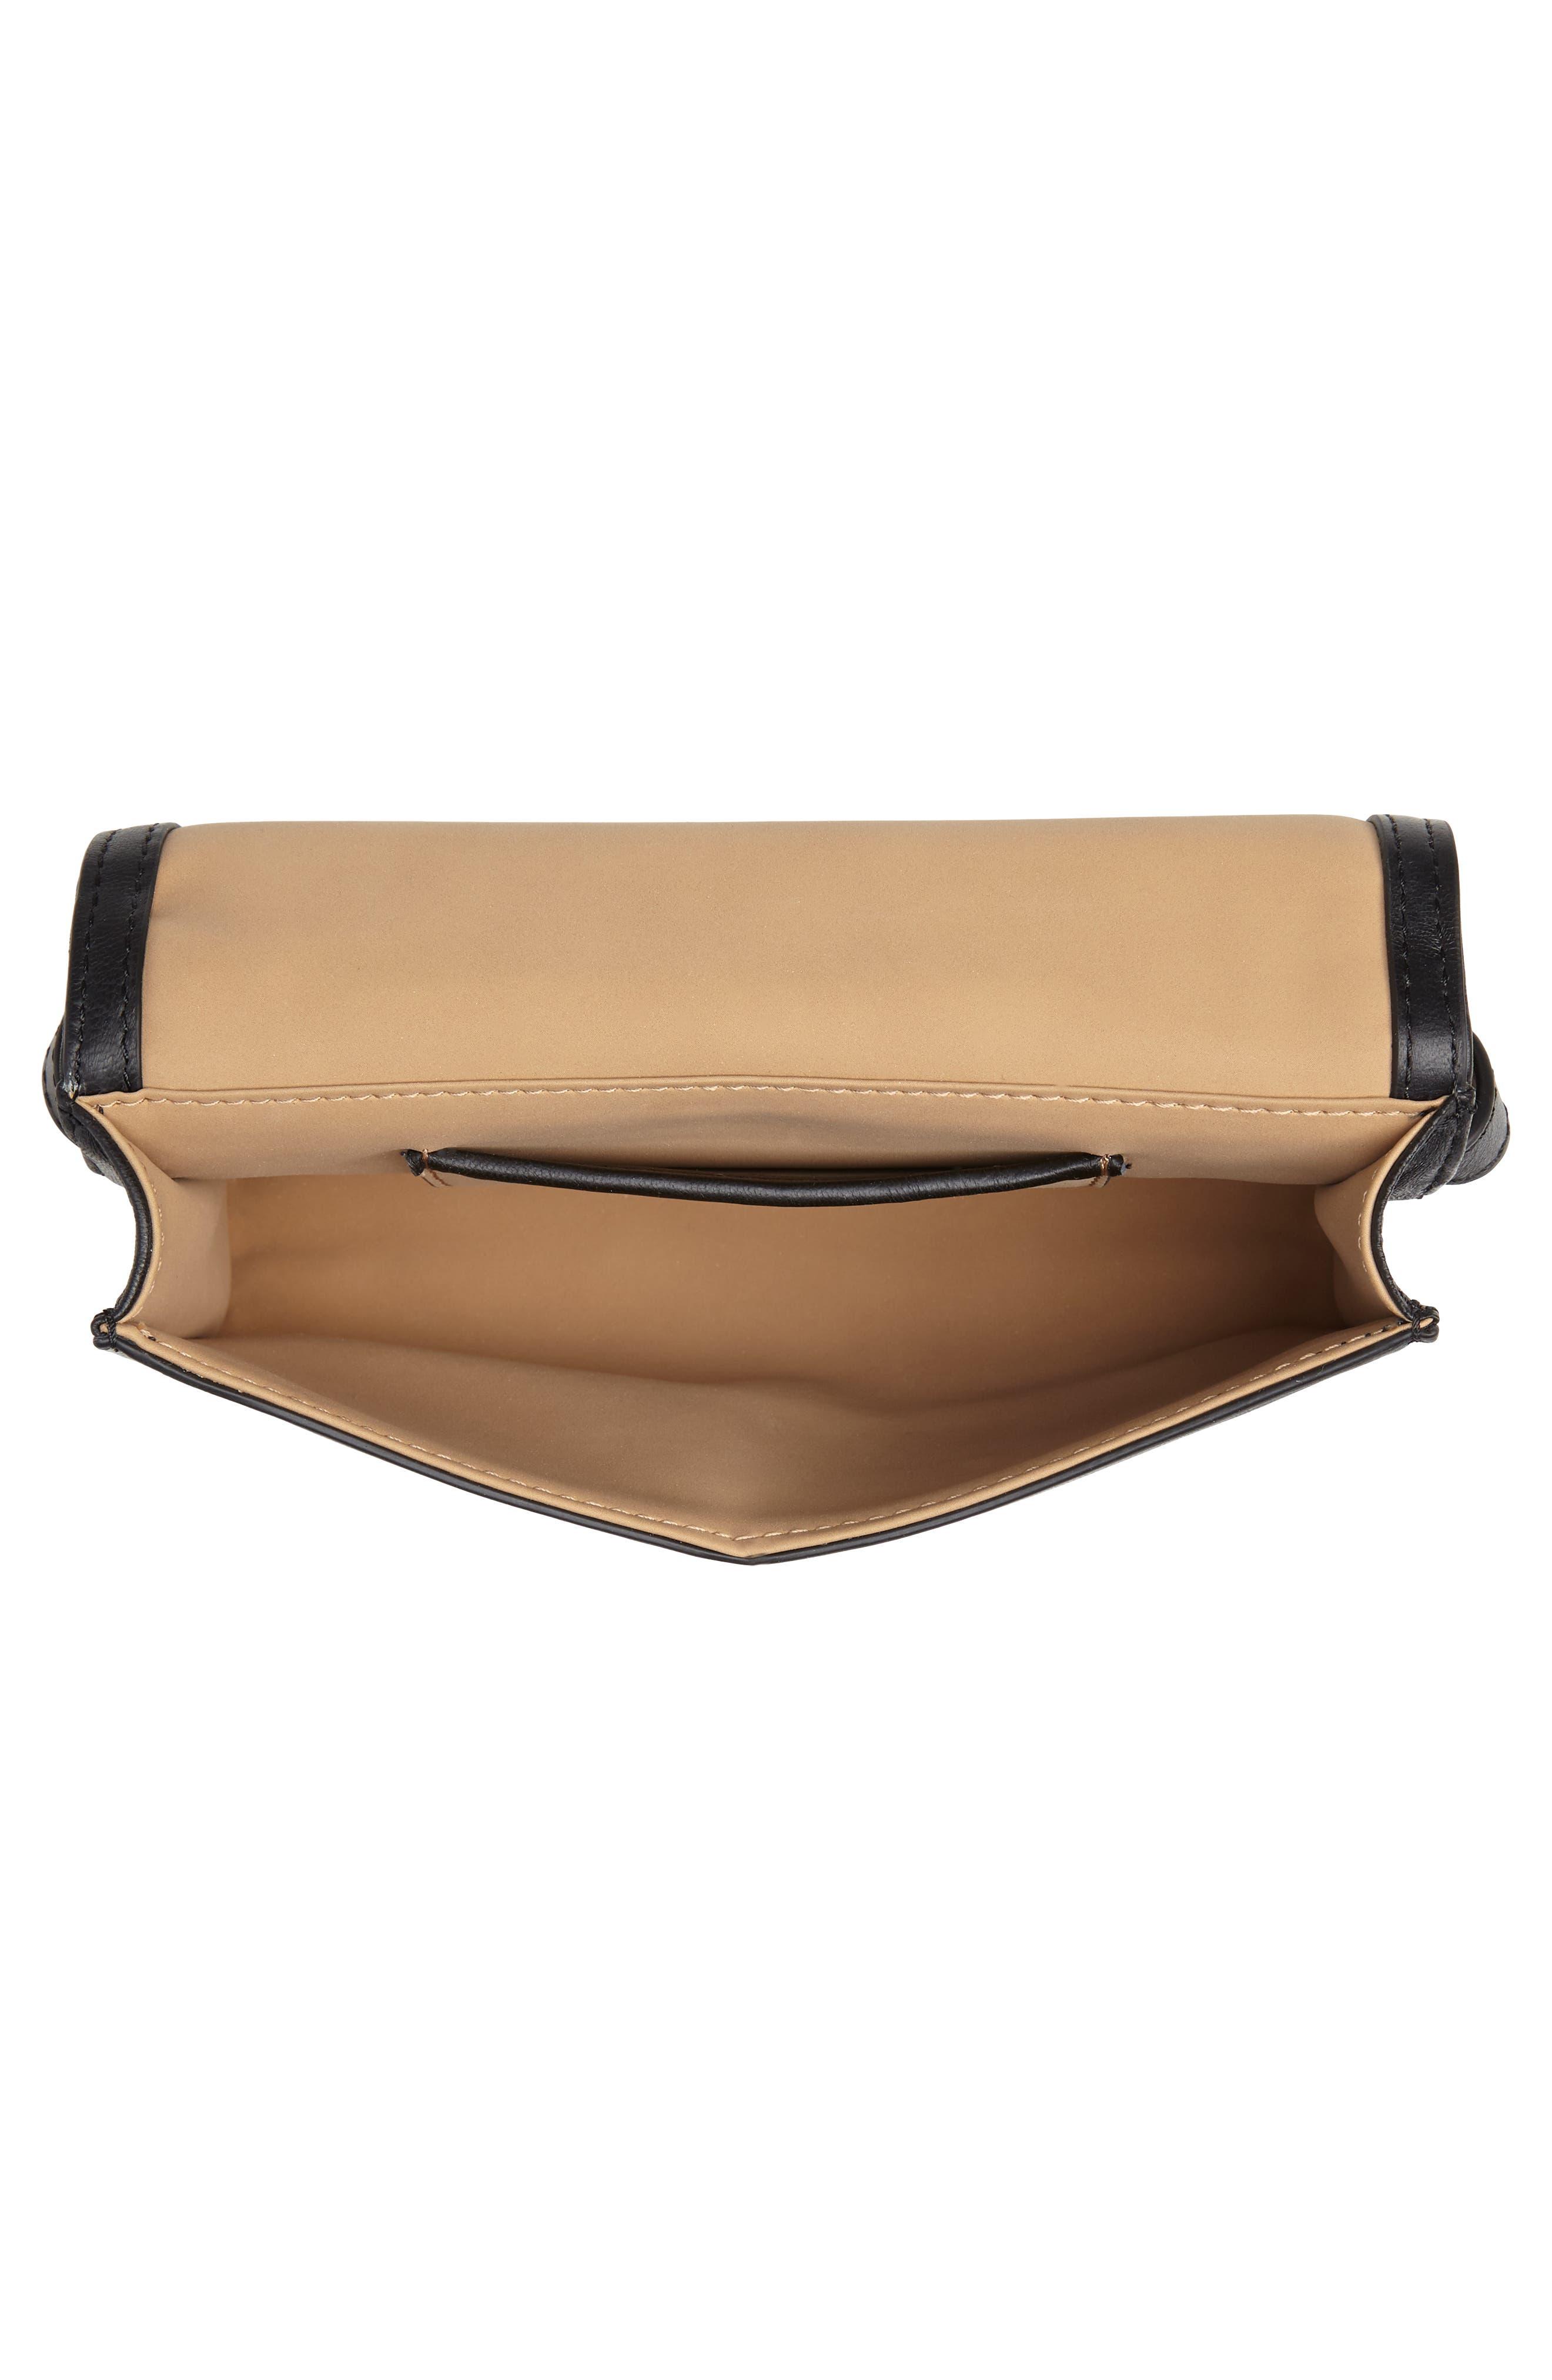 Deco M Quilted Leather Belt Bag,                             Alternate thumbnail 5, color,                             BLACK